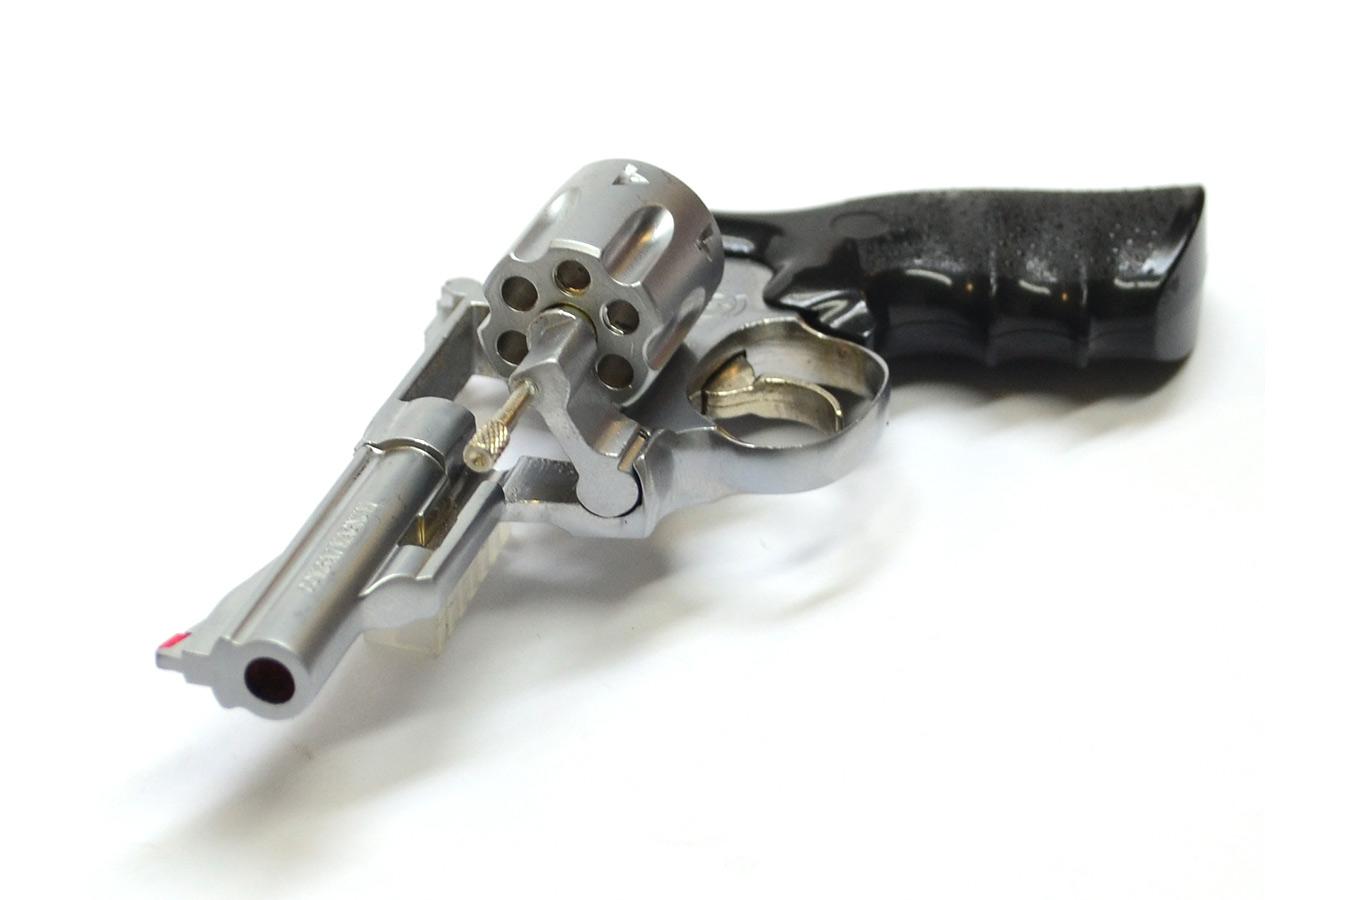 Smith & Wesson Model 29 изображение 1